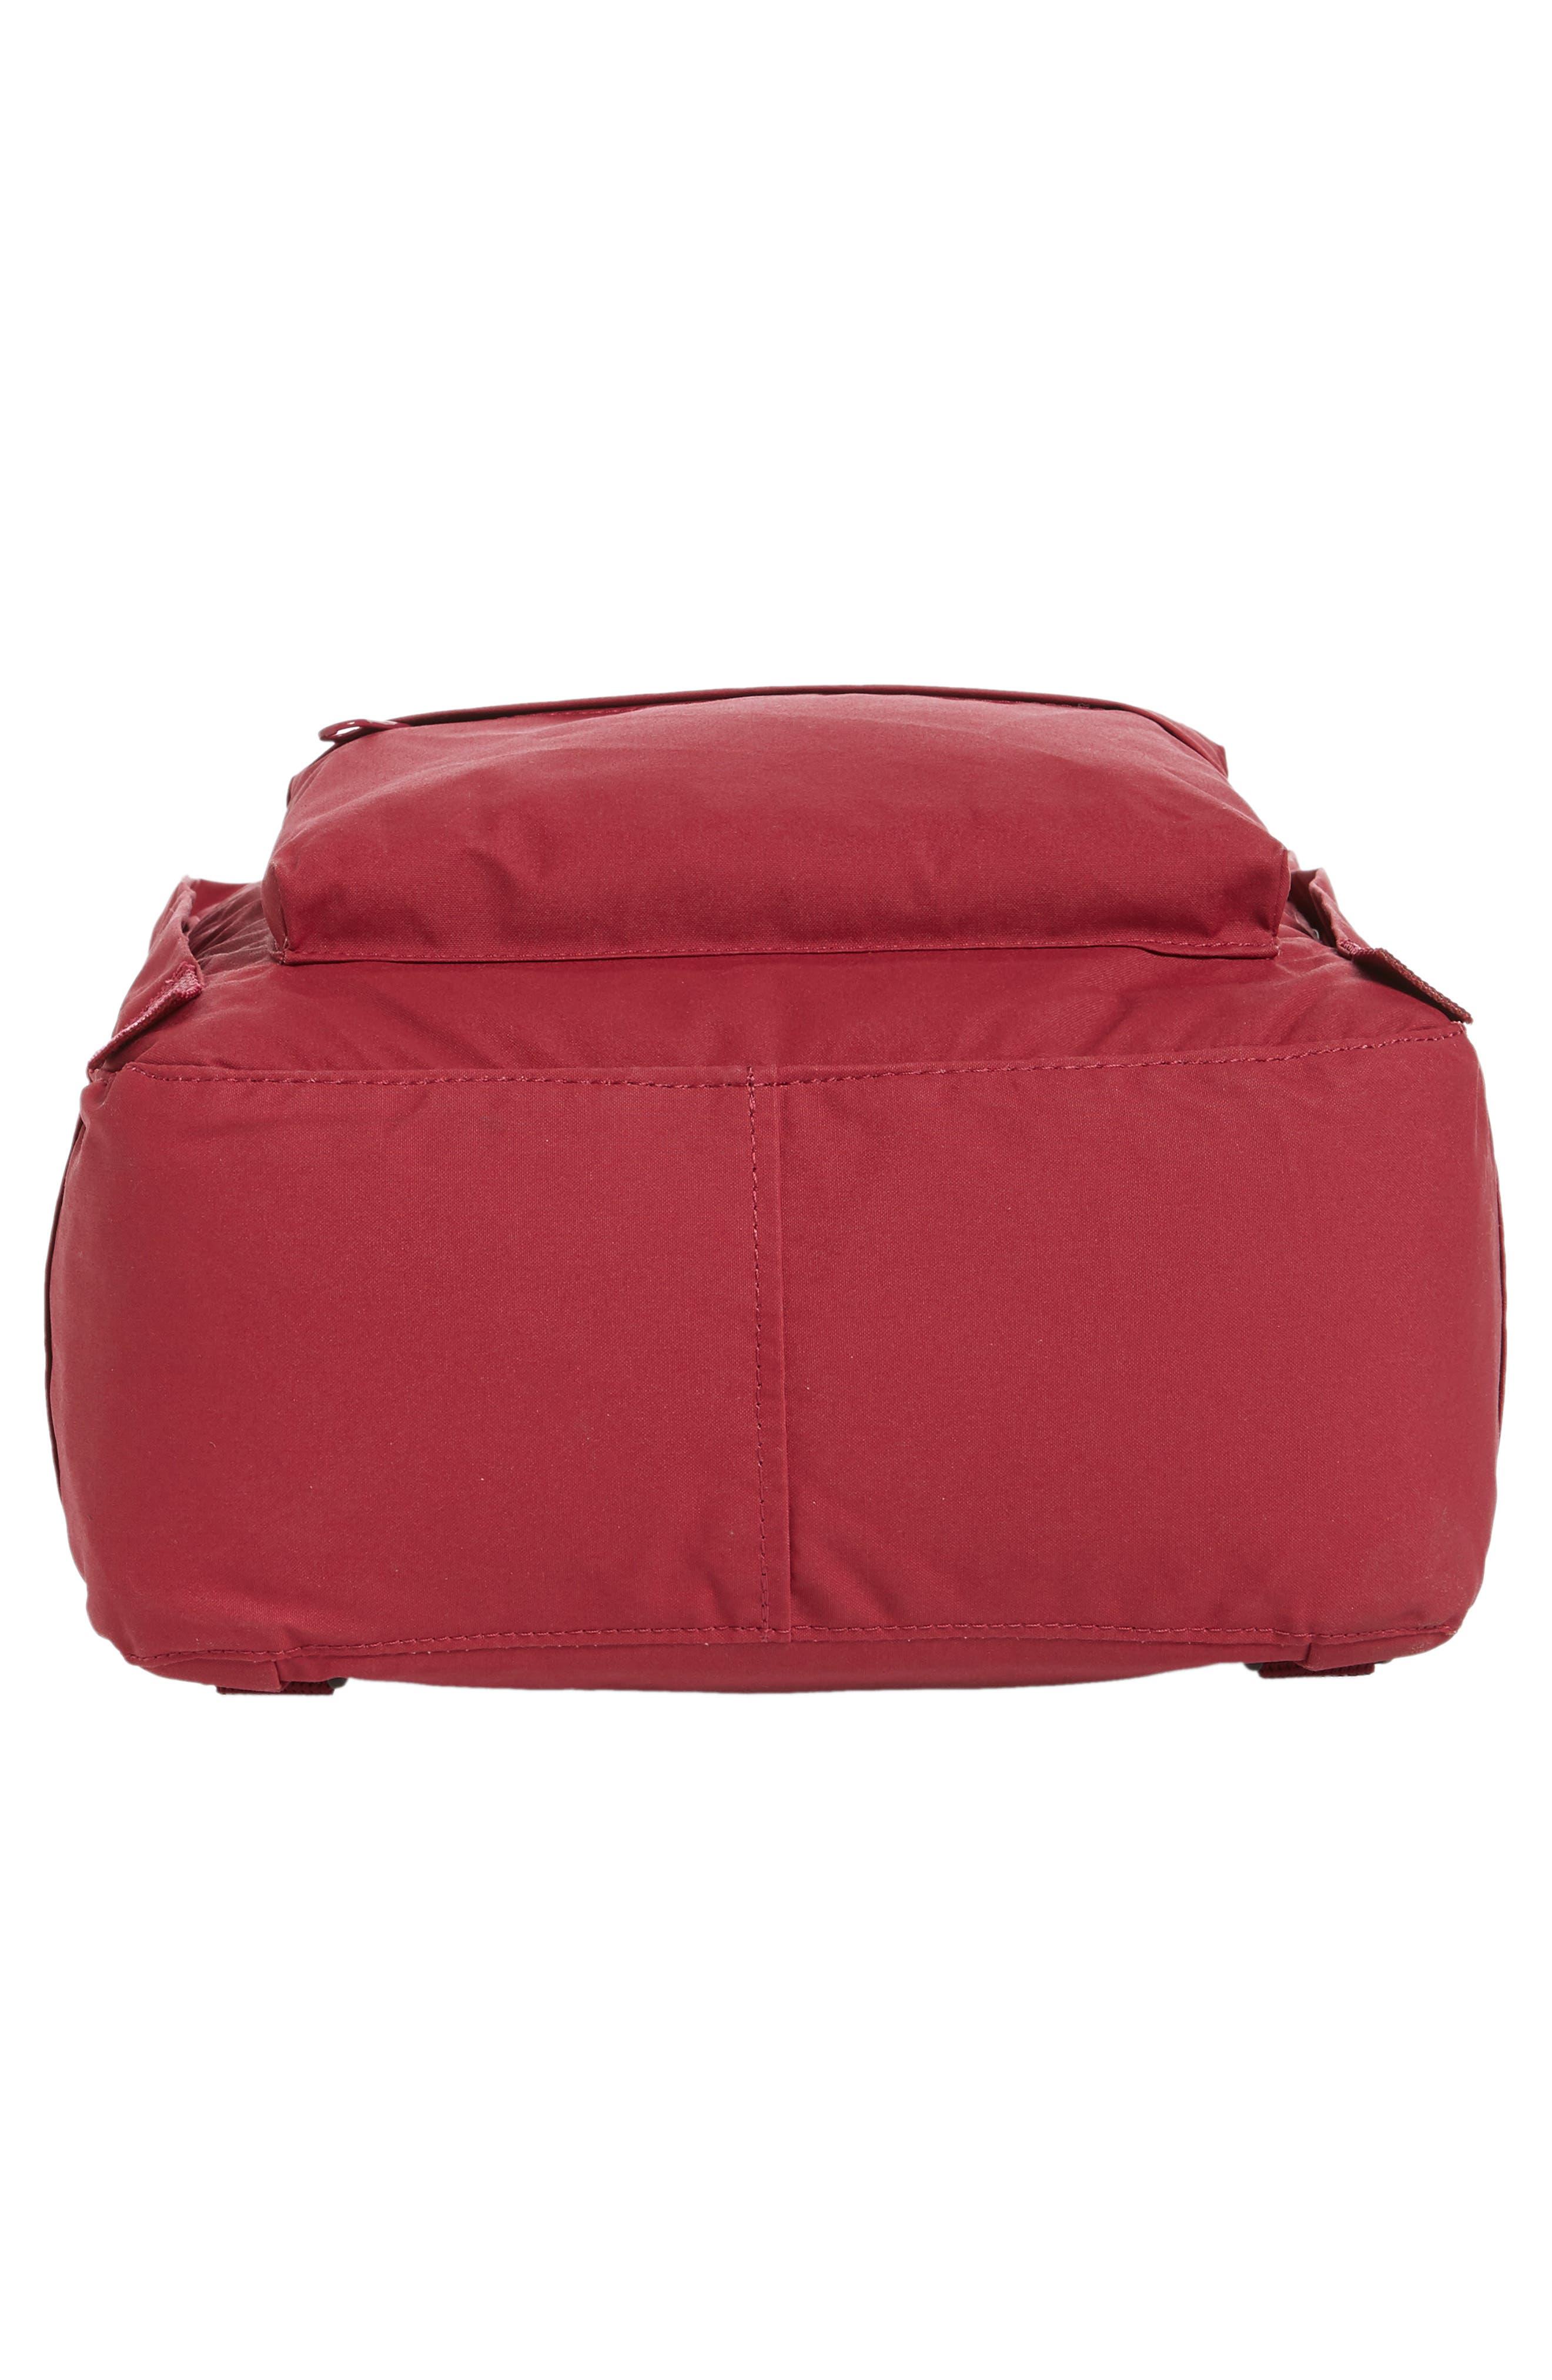 'Kånken' Water Resistant Backpack,                             Alternate thumbnail 313, color,